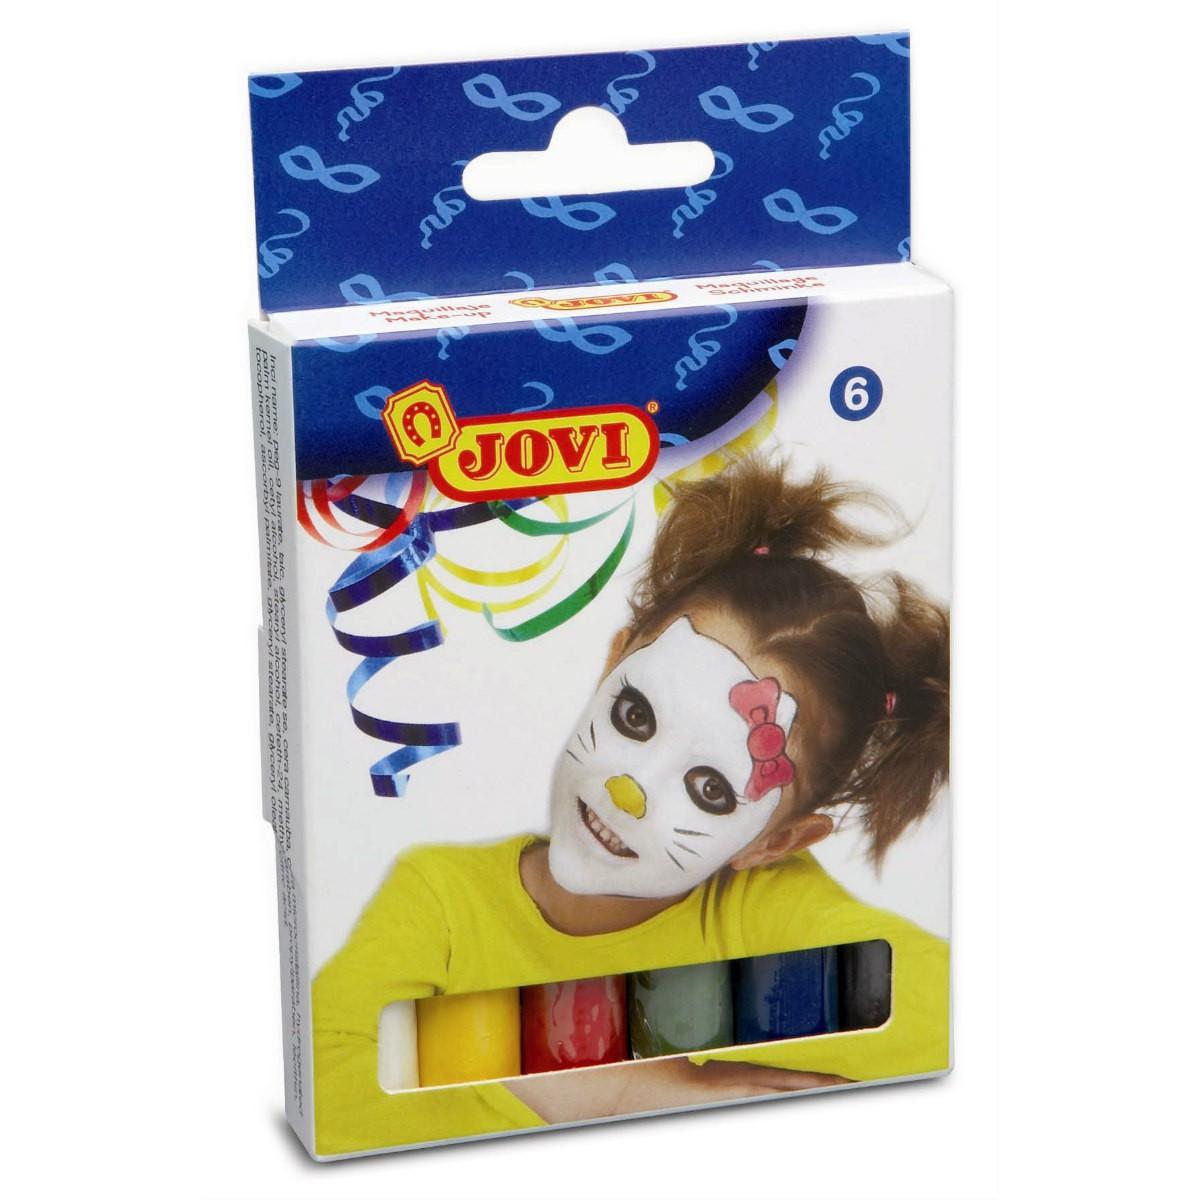 6 dicke Schminkstifte JOVI zu je 17g, Set mit 6 Farben - Kinder Schminke Karneval